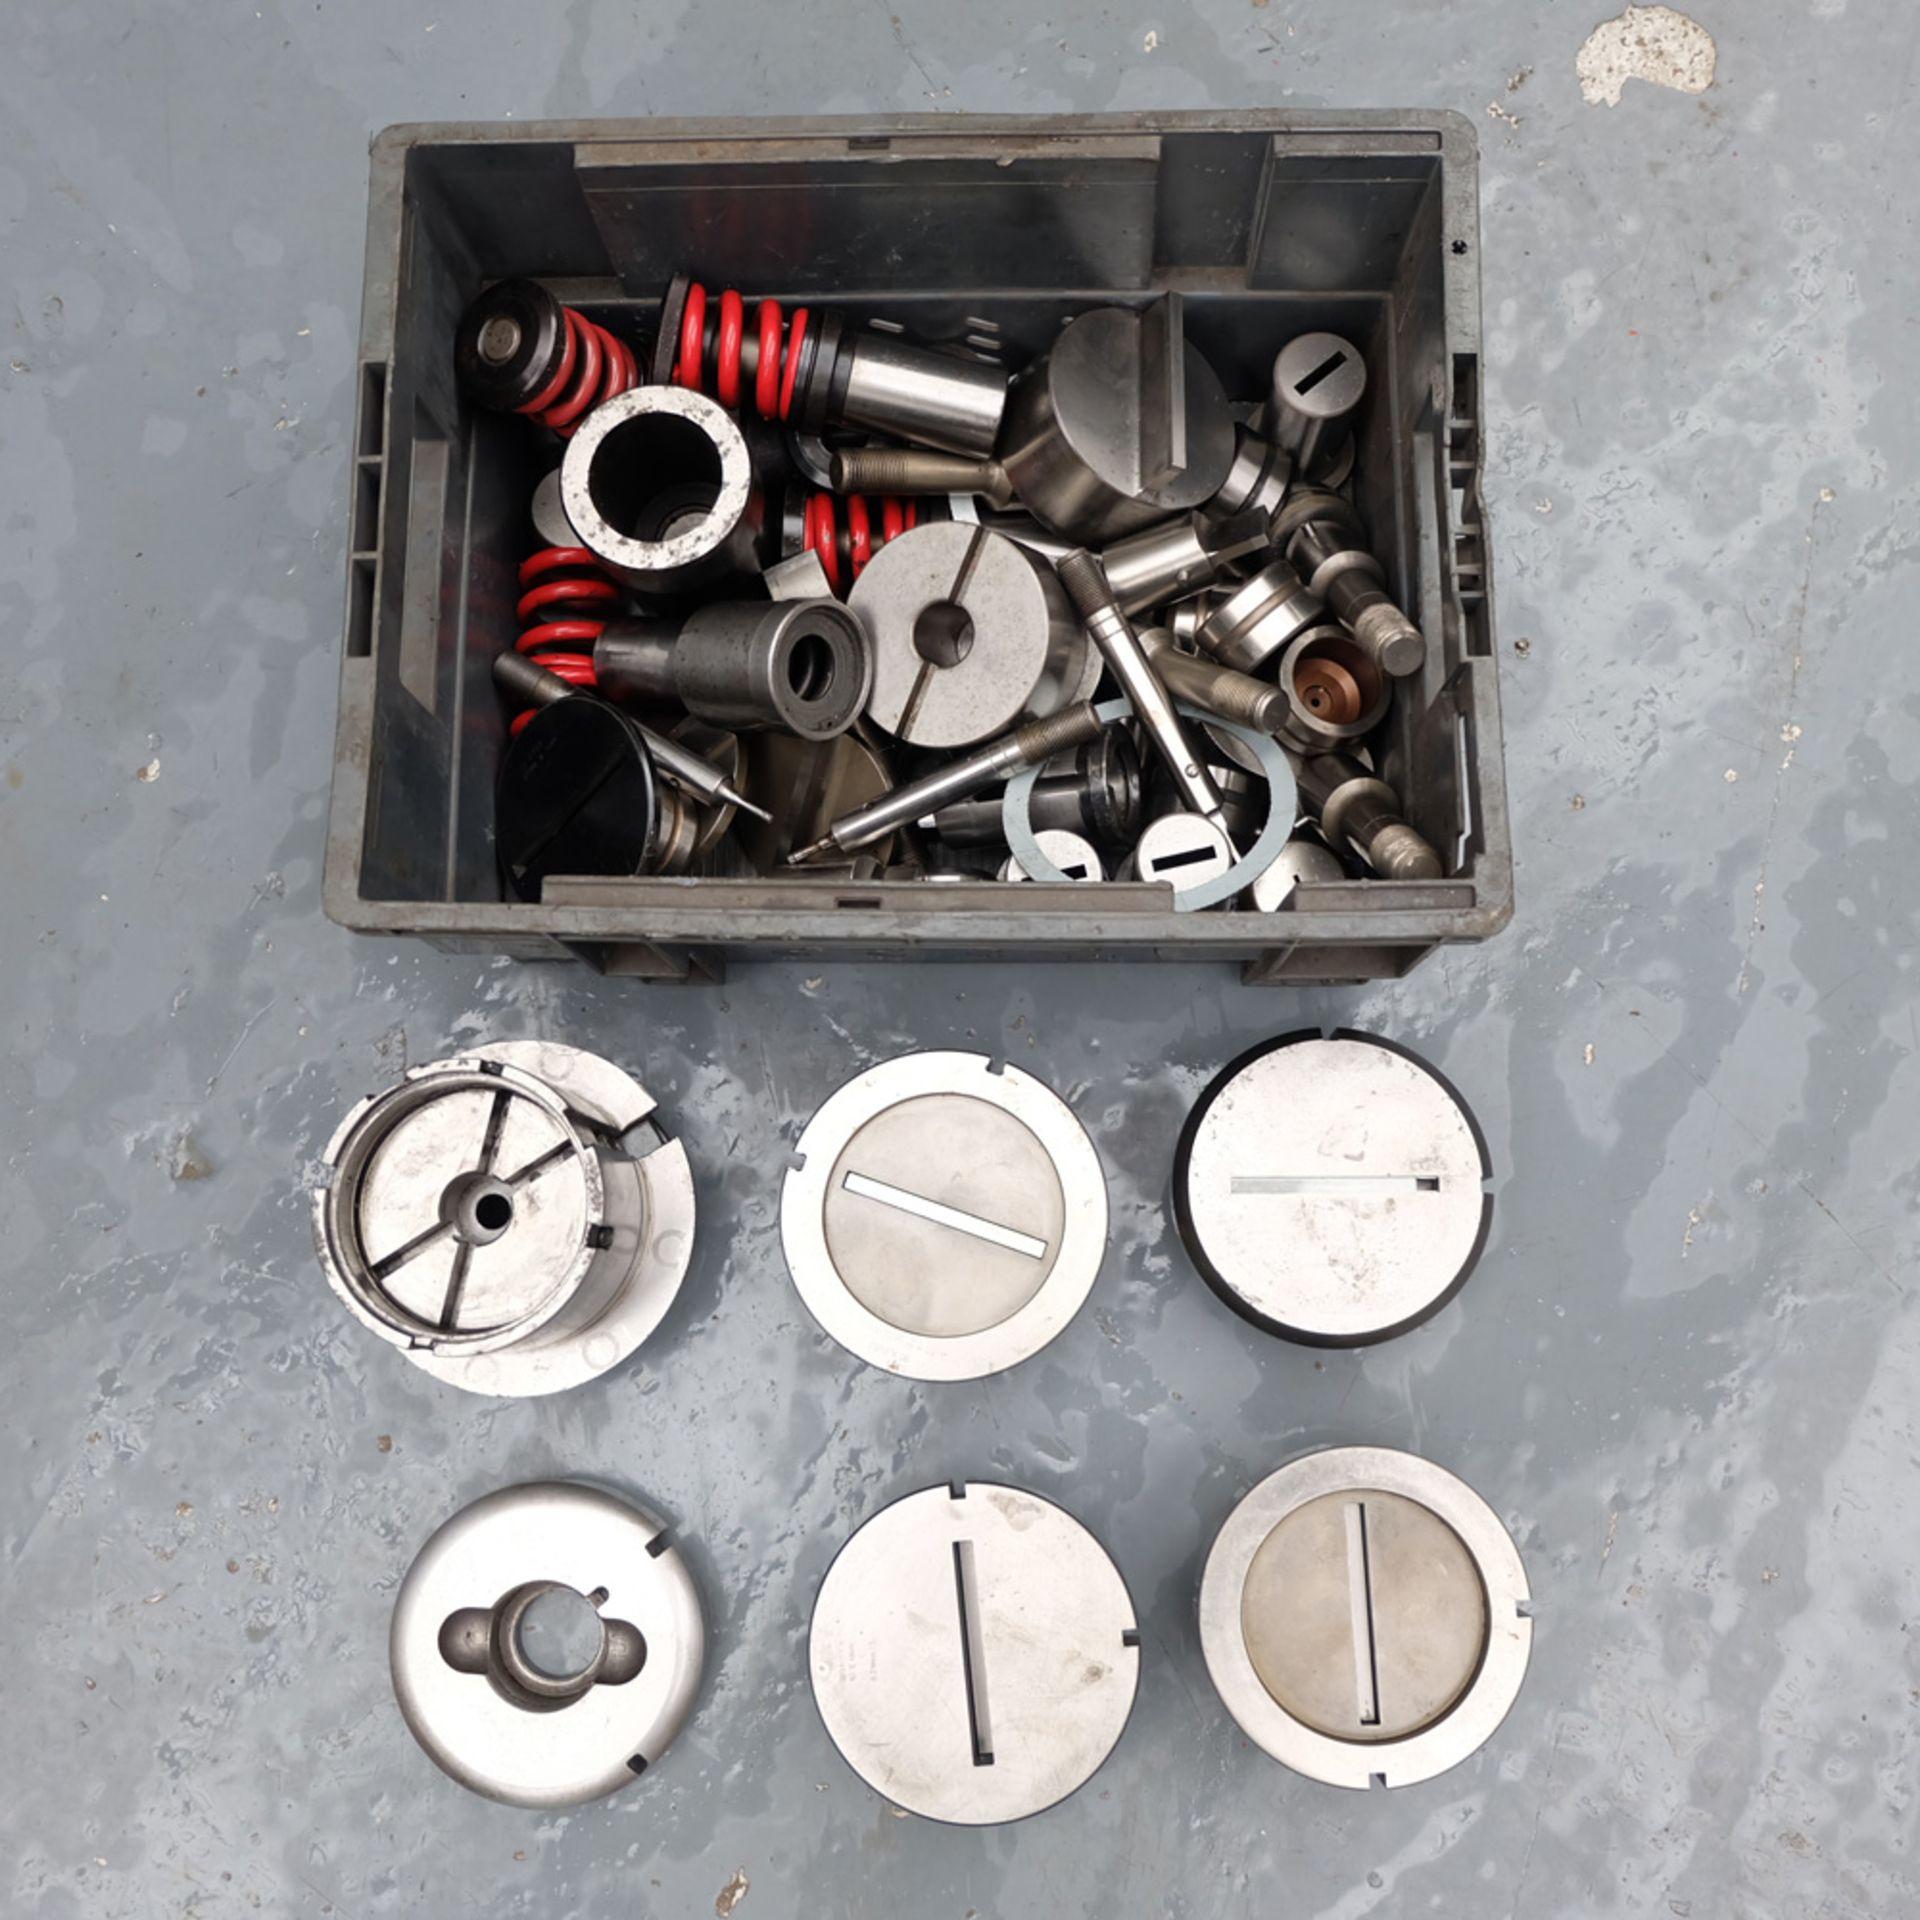 LVD Shape Delta 1000 Thick CNC Turret Punching Machine. - Image 16 of 18